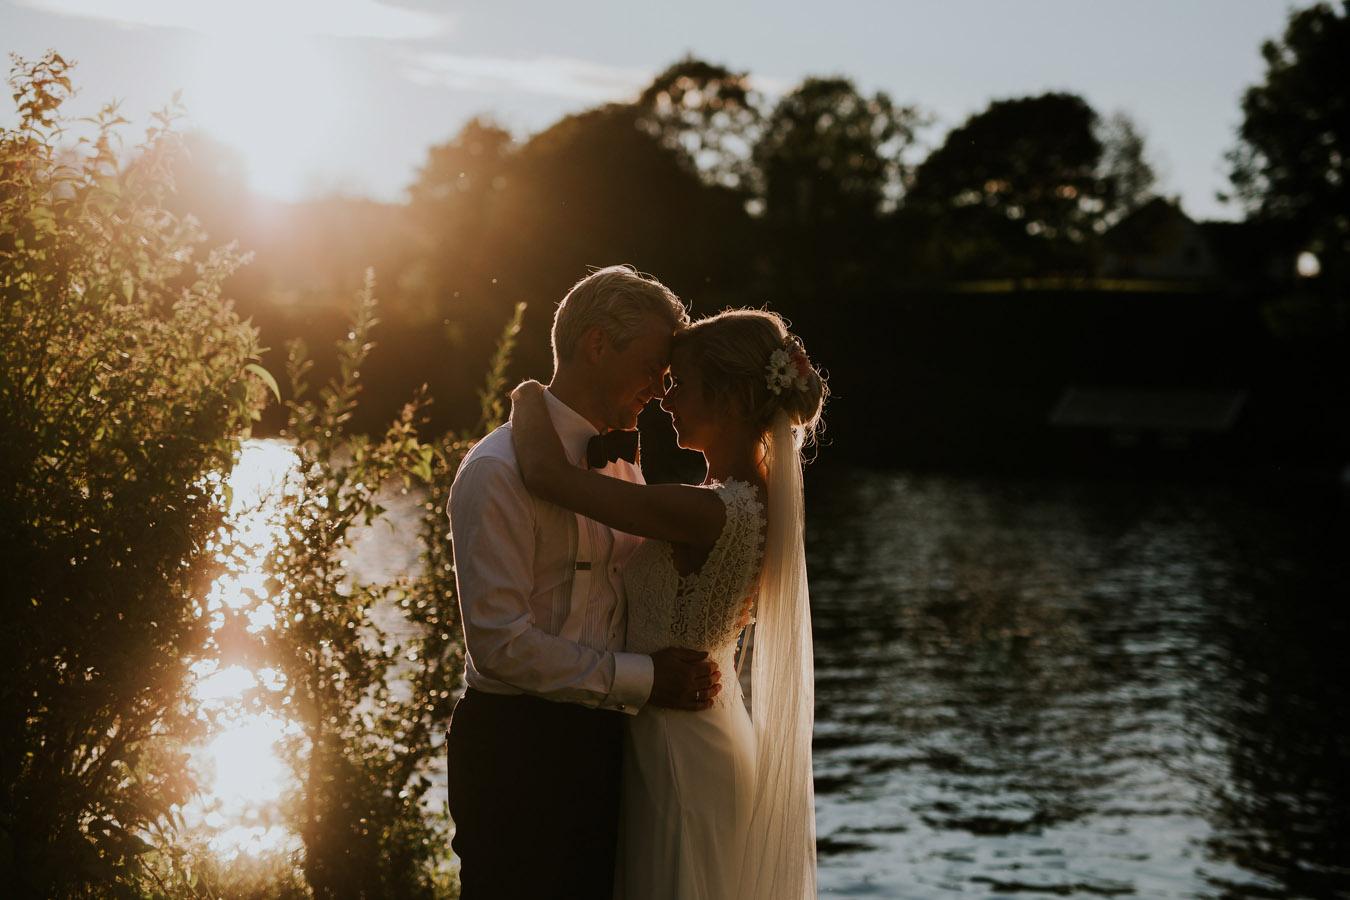 Fotograf-Tone-Tvedt-bryllup-201.jpg